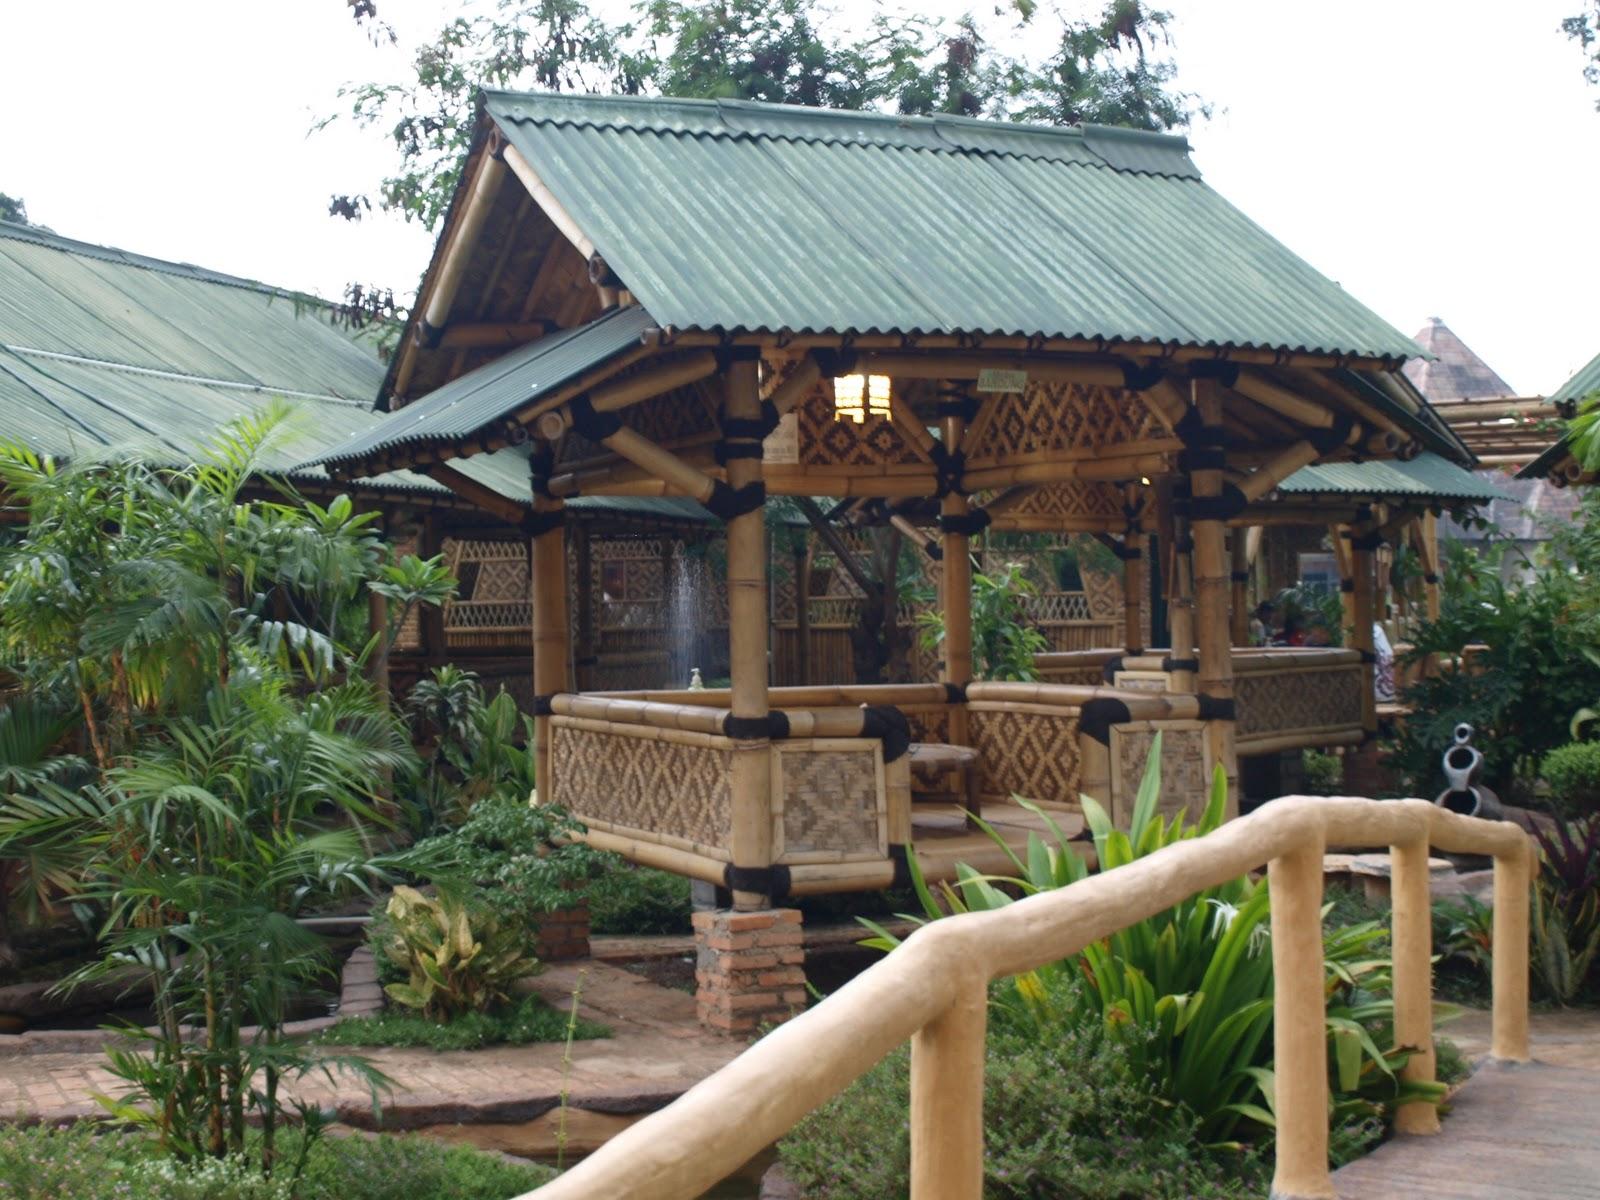 RESTORAN DJAVA DI BEKASI: Djava Resto di Bekasi Utara